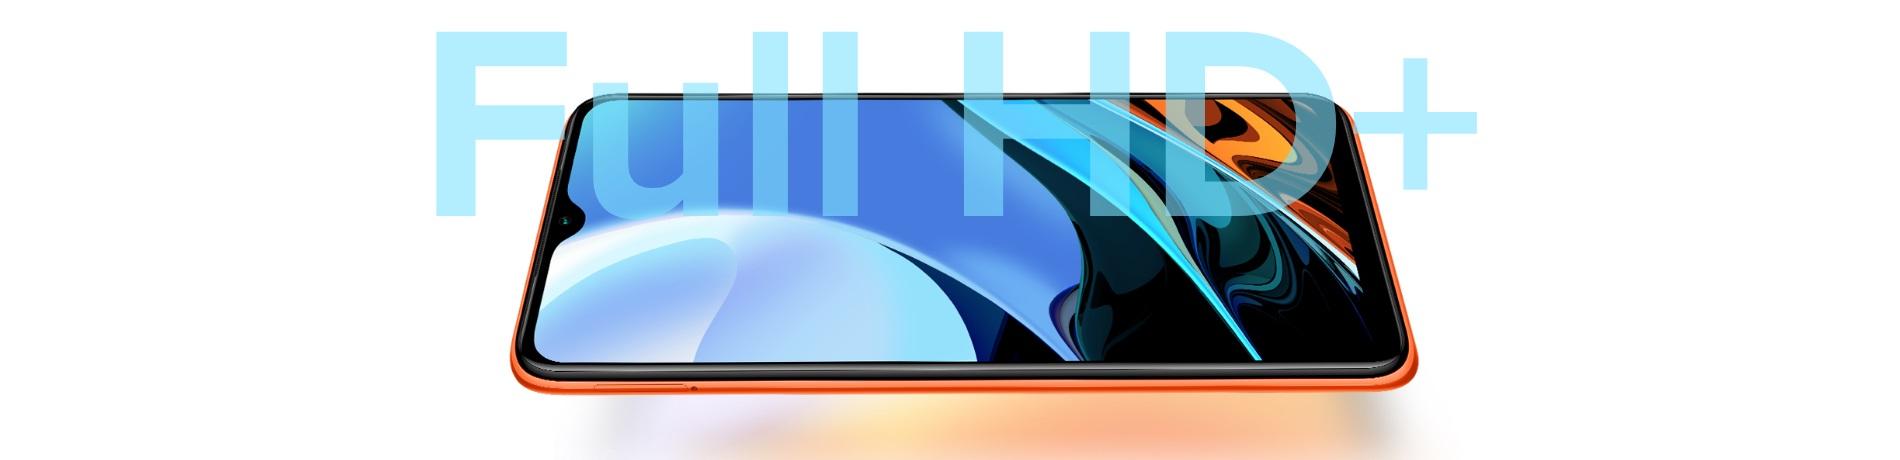 smartfon Redmi 9 Power smartphone